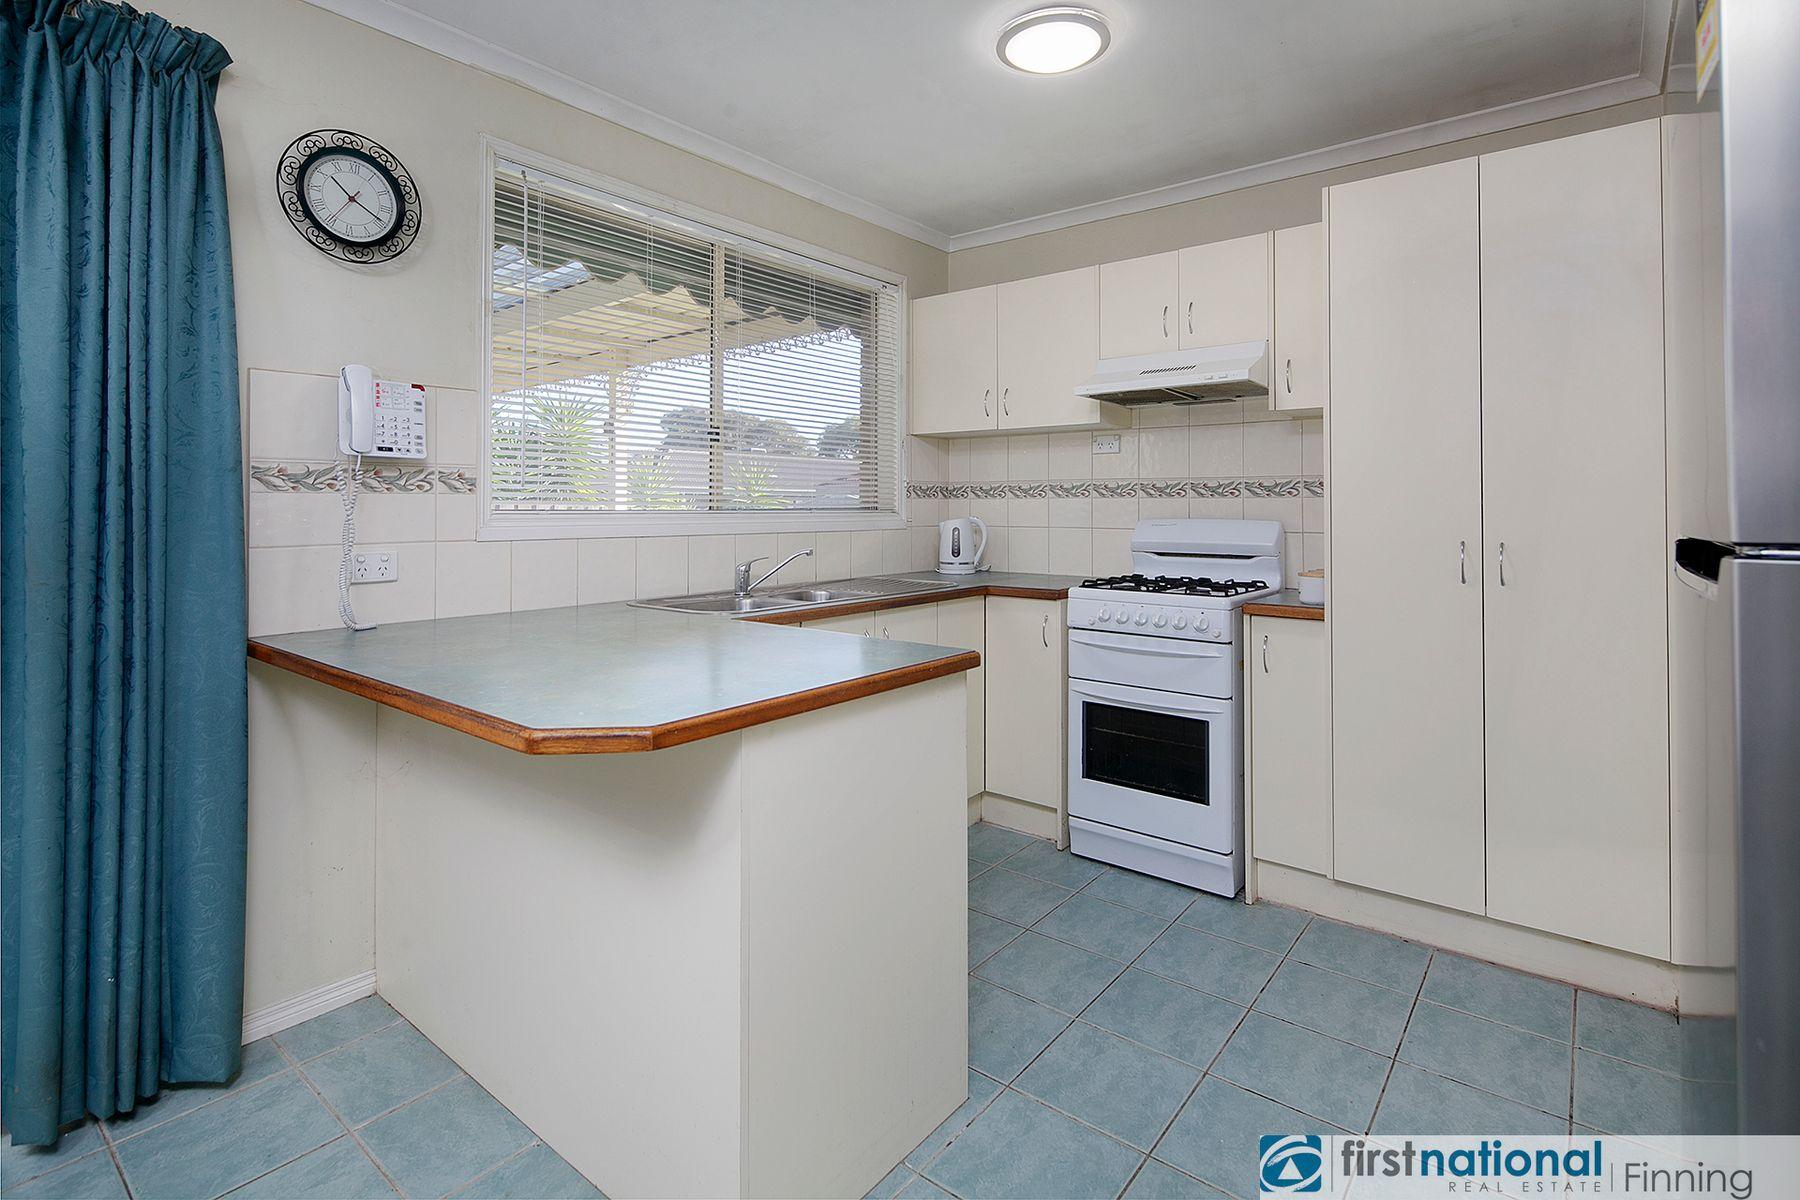 8 Alberton Drive, Cranbourne West, VIC 3977